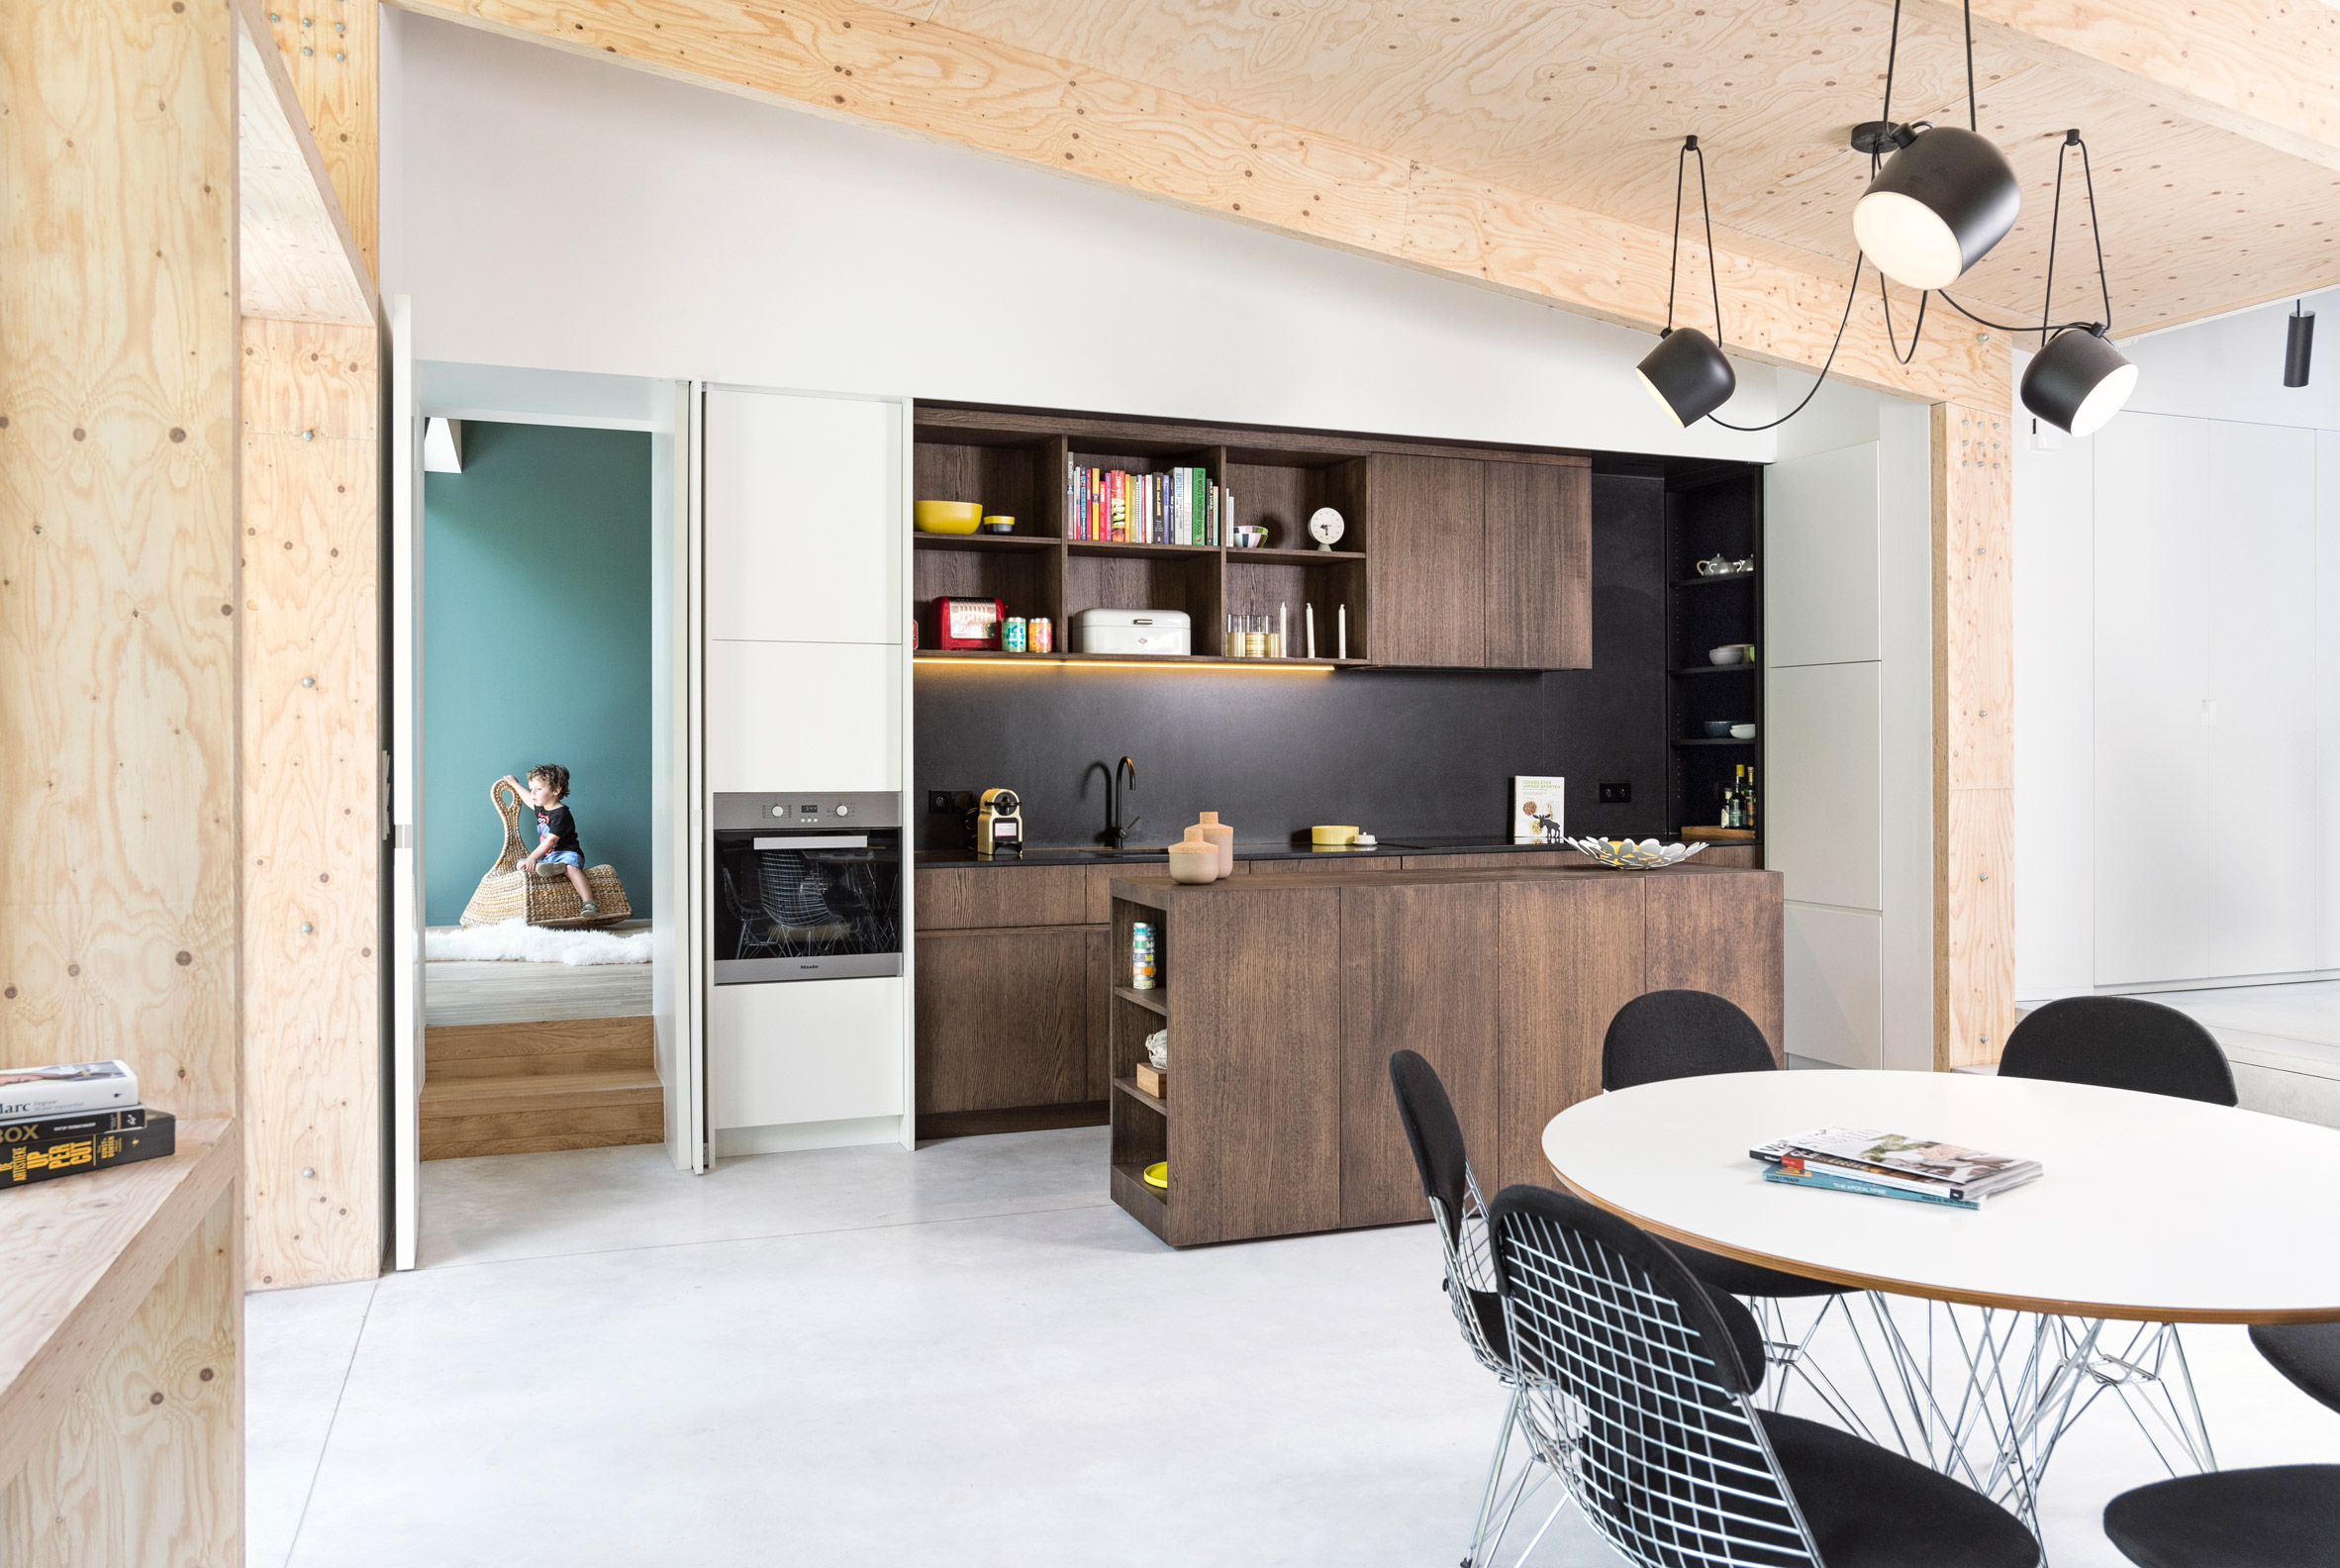 architecture-semi-detached-house-with-an-outdoor-areadesign-studia-interiors-osnovadesign-osnova-poltava_02